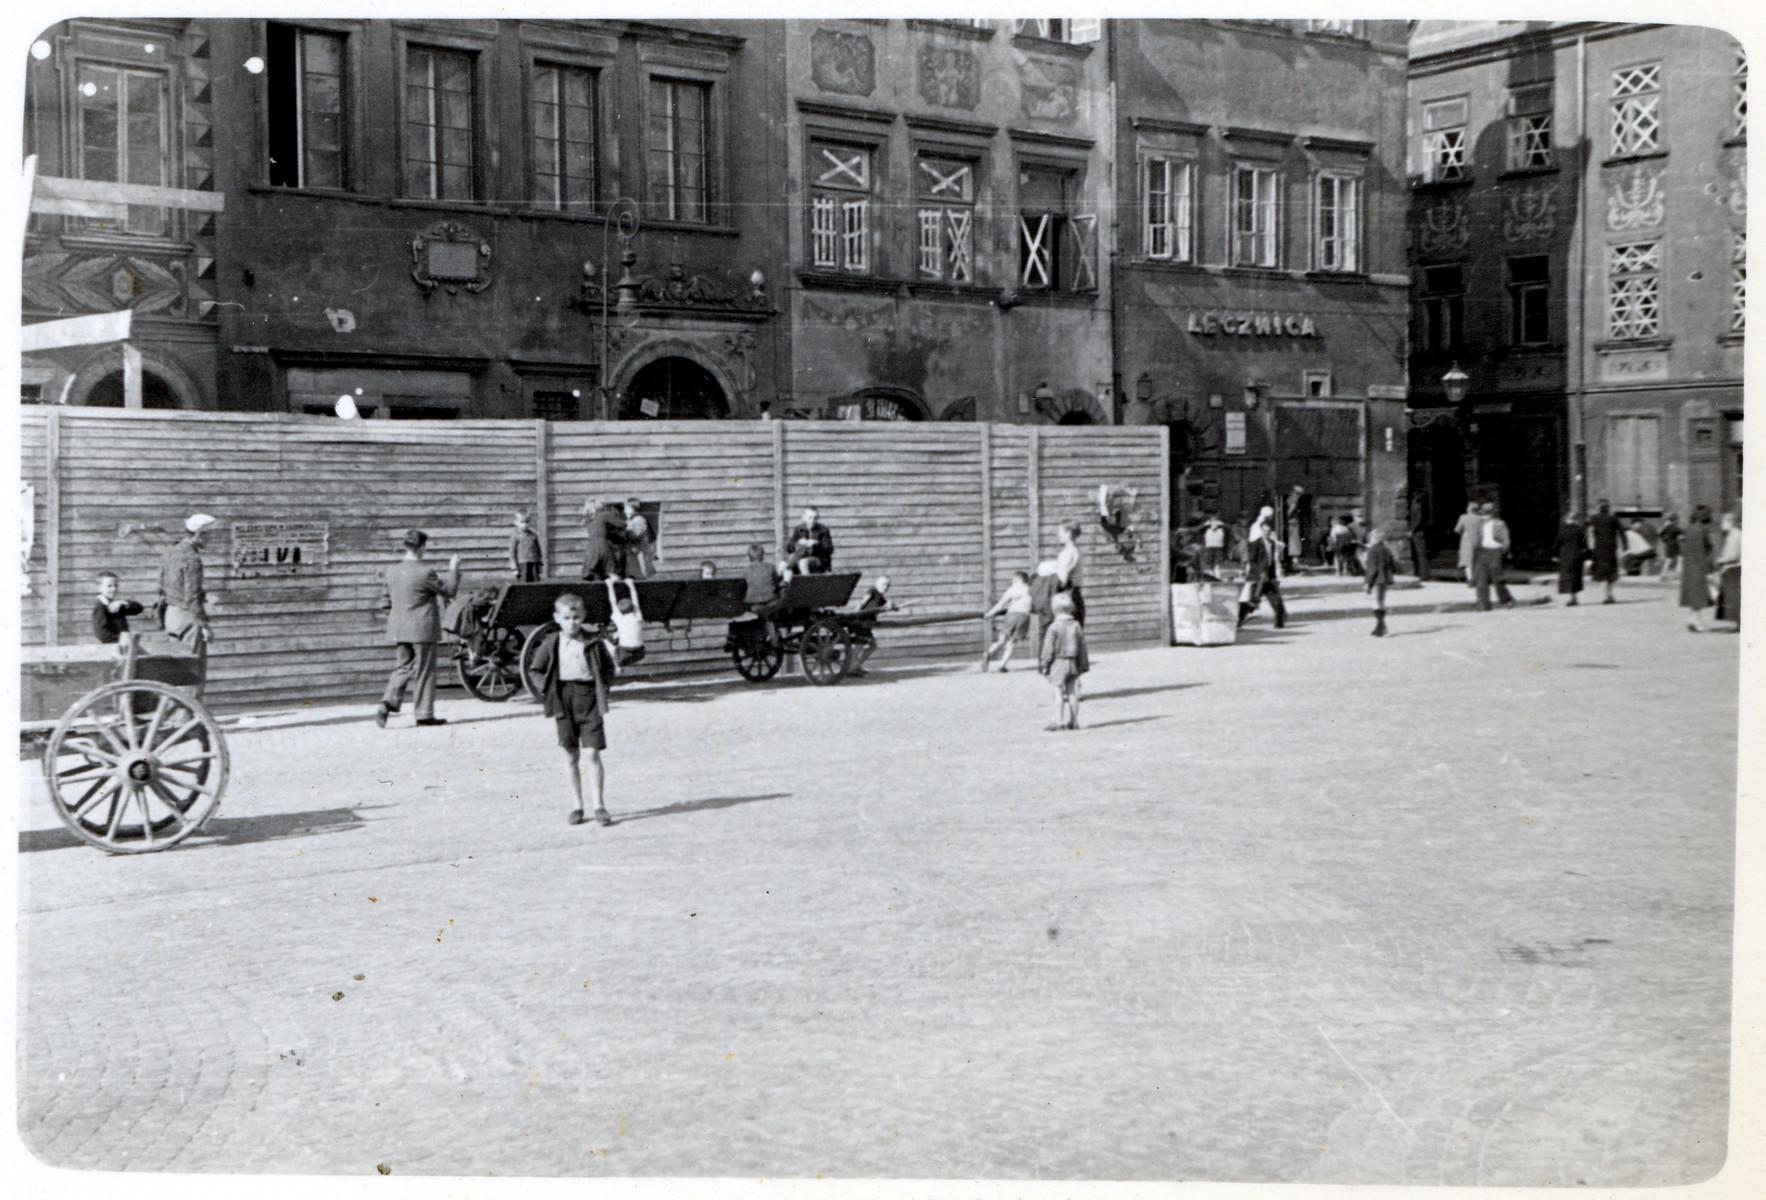 A street scene from besieged Warsaw.